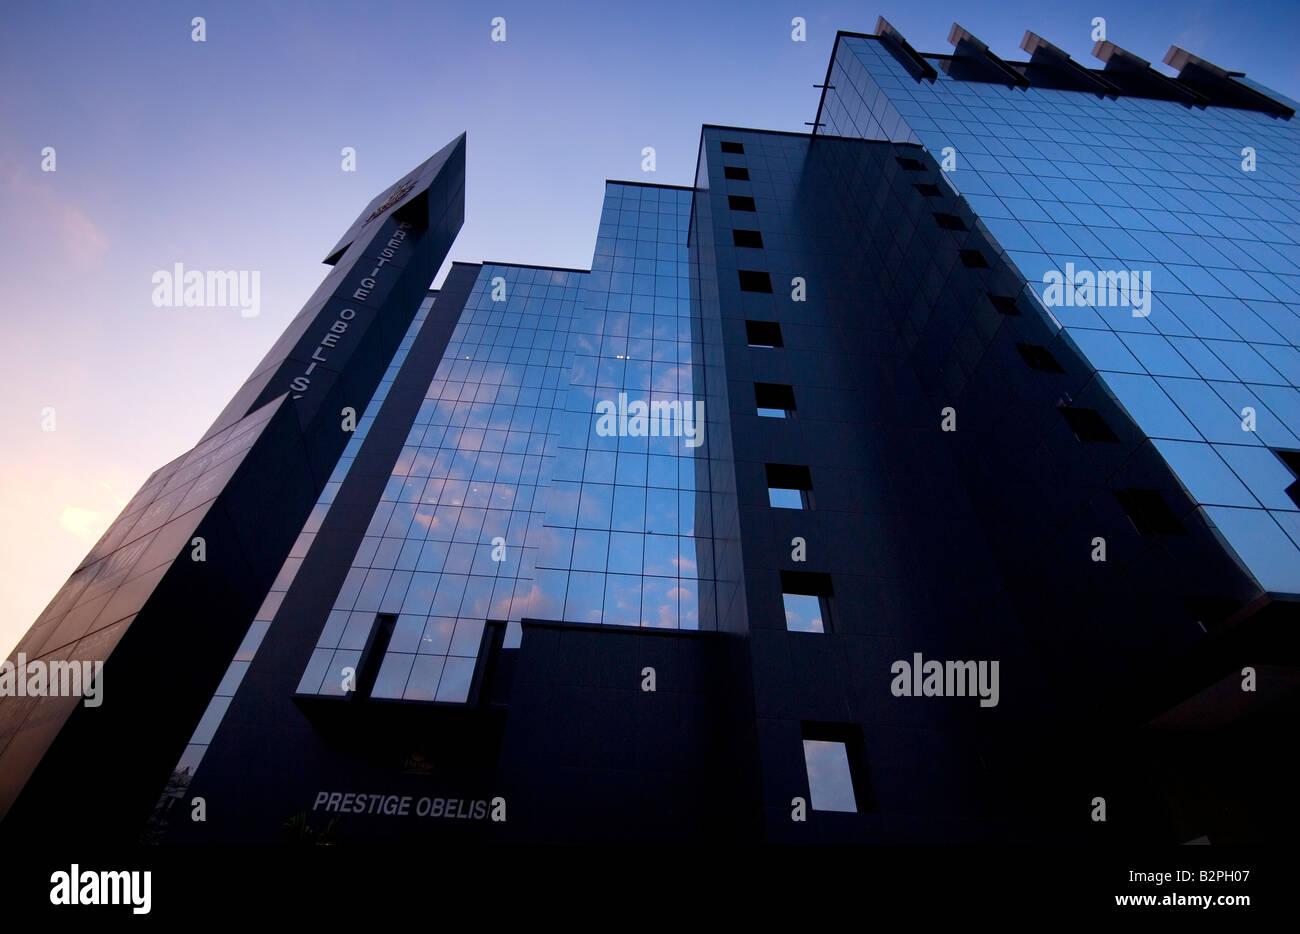 Edifici moderni, MG Road Area, Shanthala Nagar, Bengaluru (Bangalore), a sud di Karnataka, India Immagini Stock